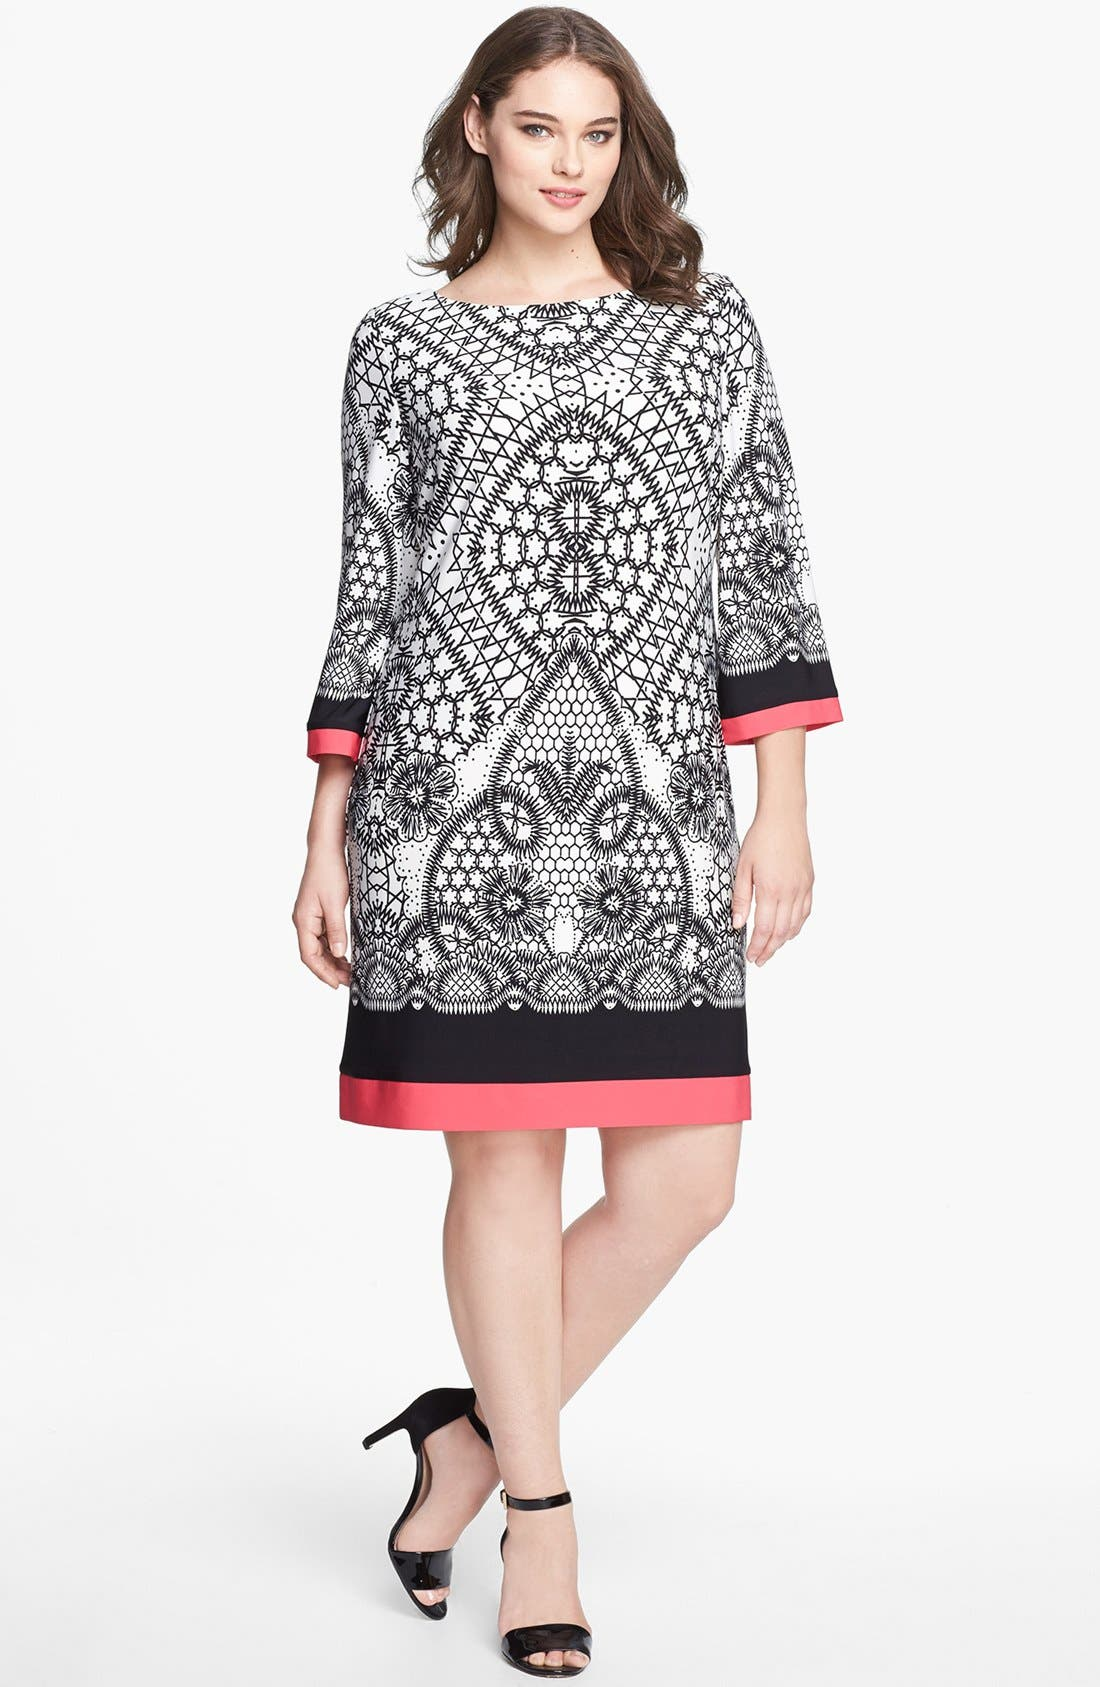 Alternate Image 1 Selected - Eliza J Print Jersey Shift Dress (Plus Size)